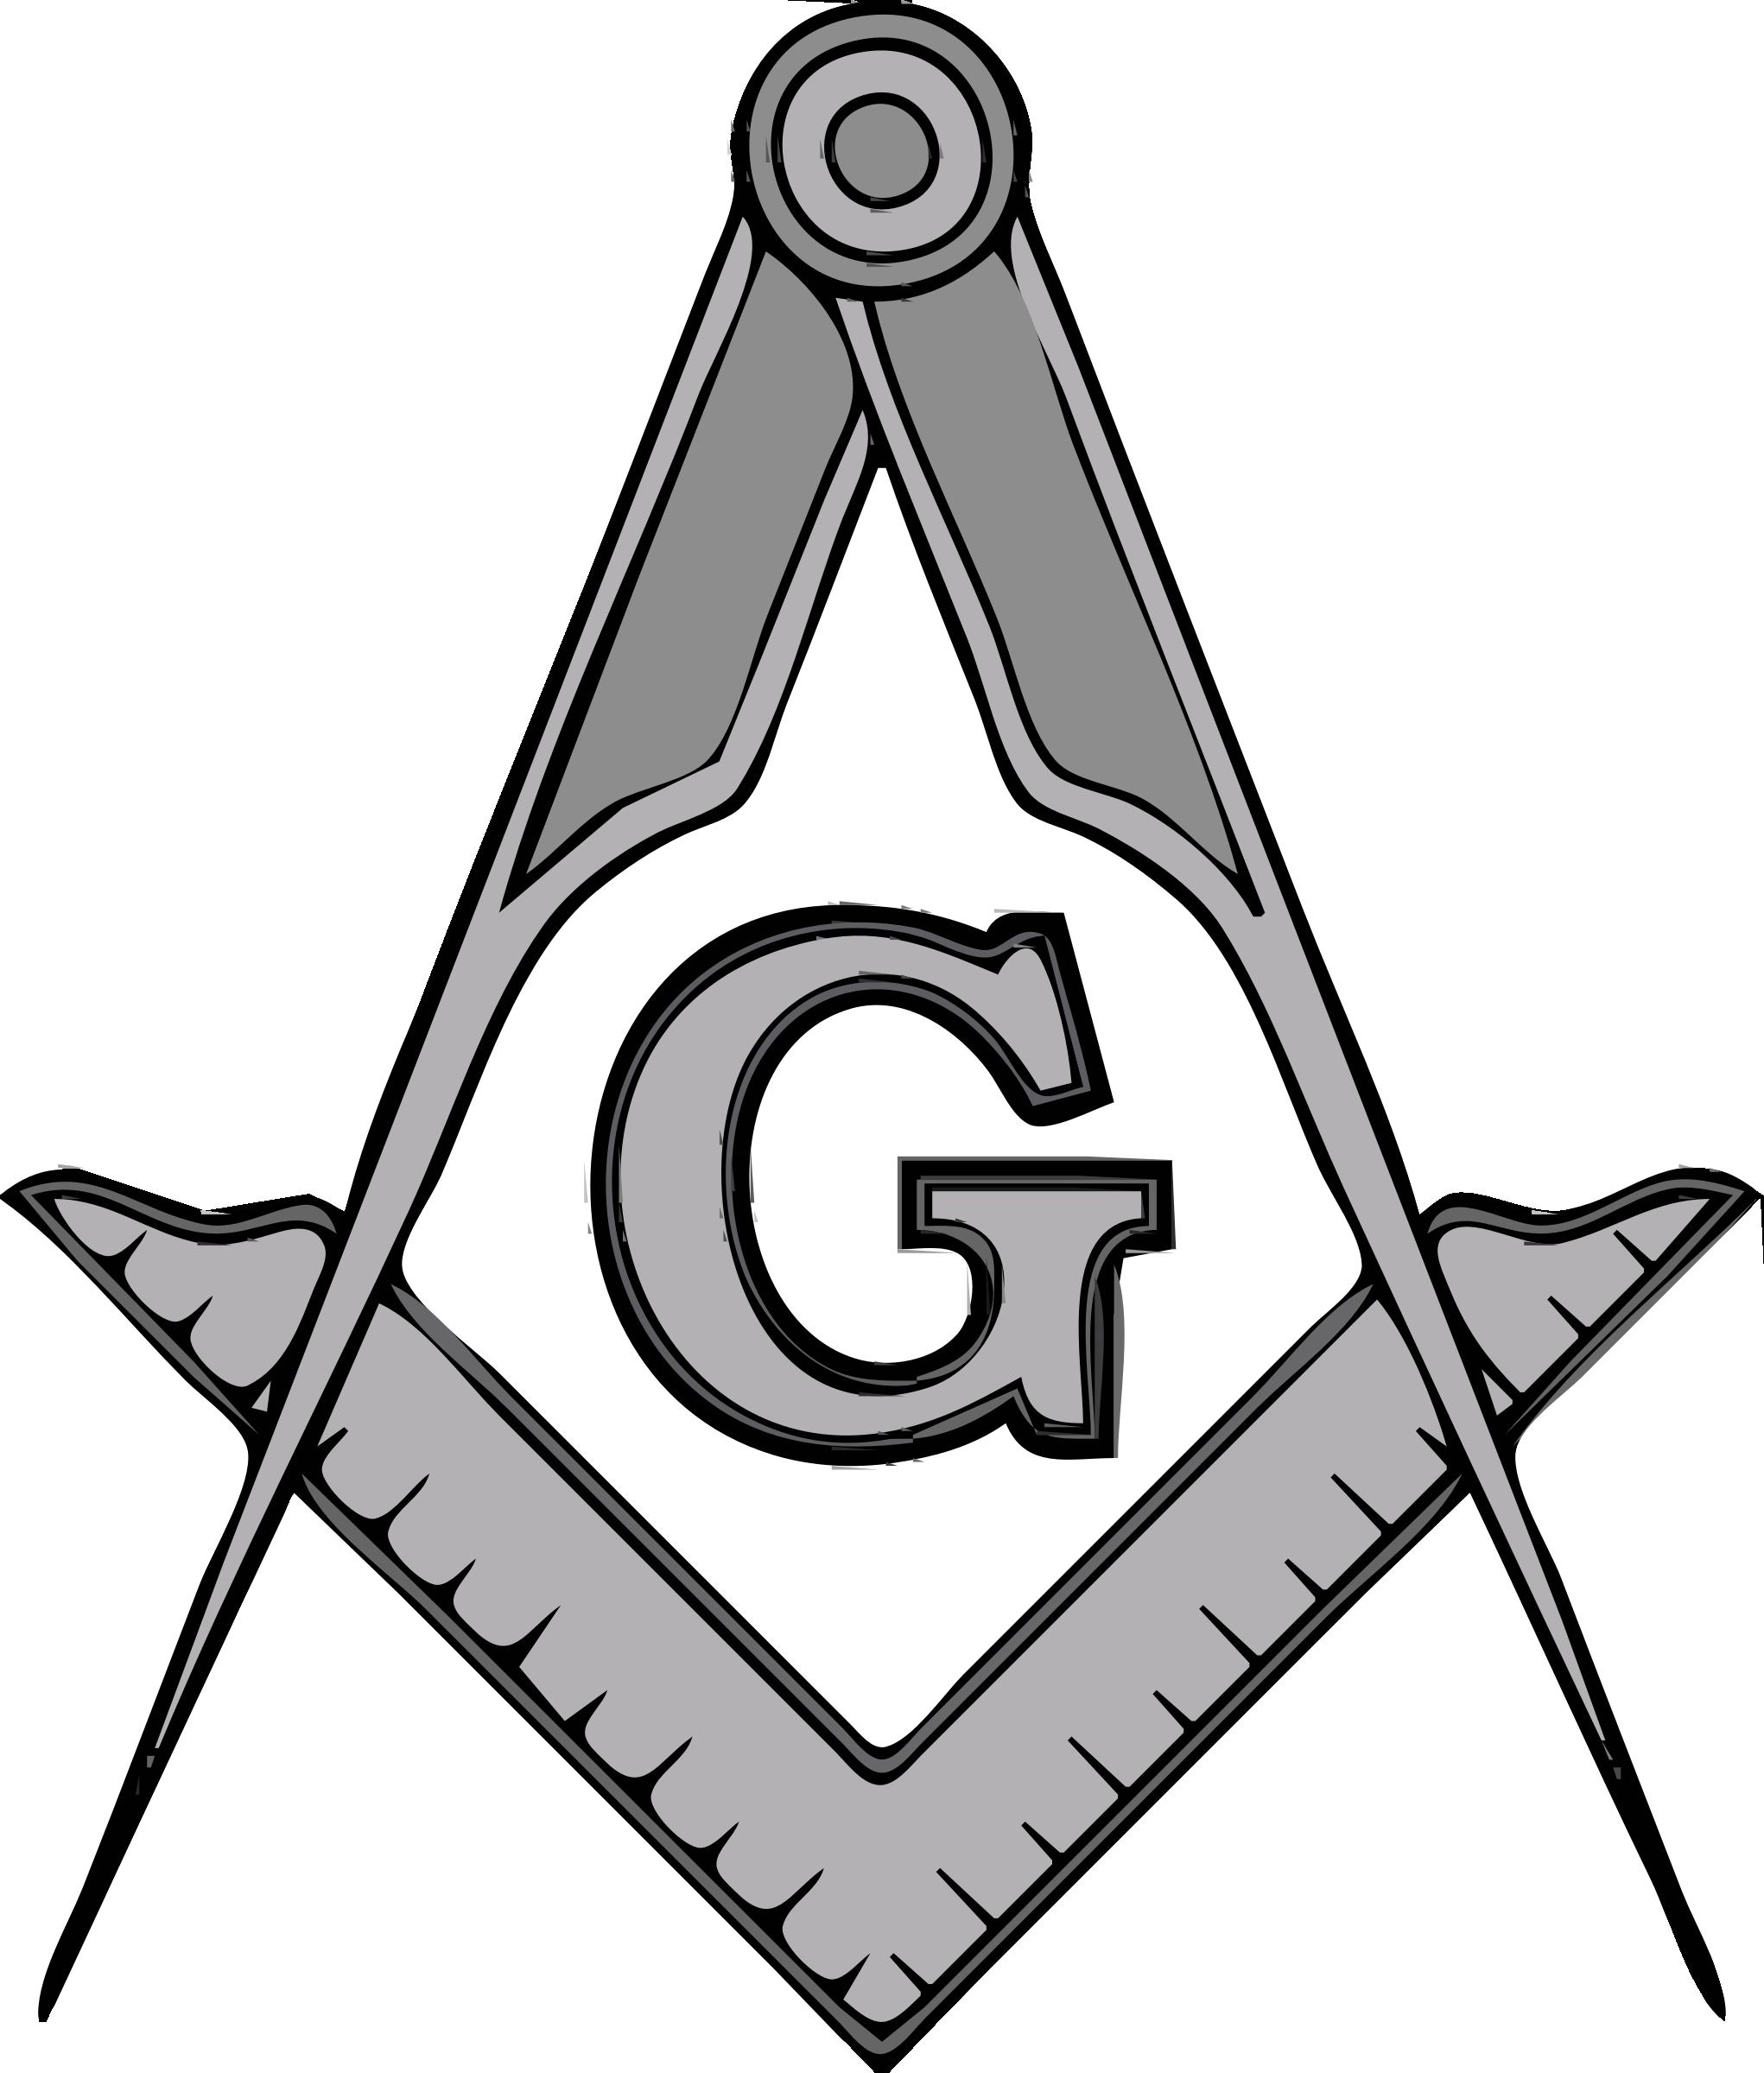 Mason logo clipart vector transparent Masonic Clipart   Free download best Masonic Clipart on ClipArtMag.com vector transparent